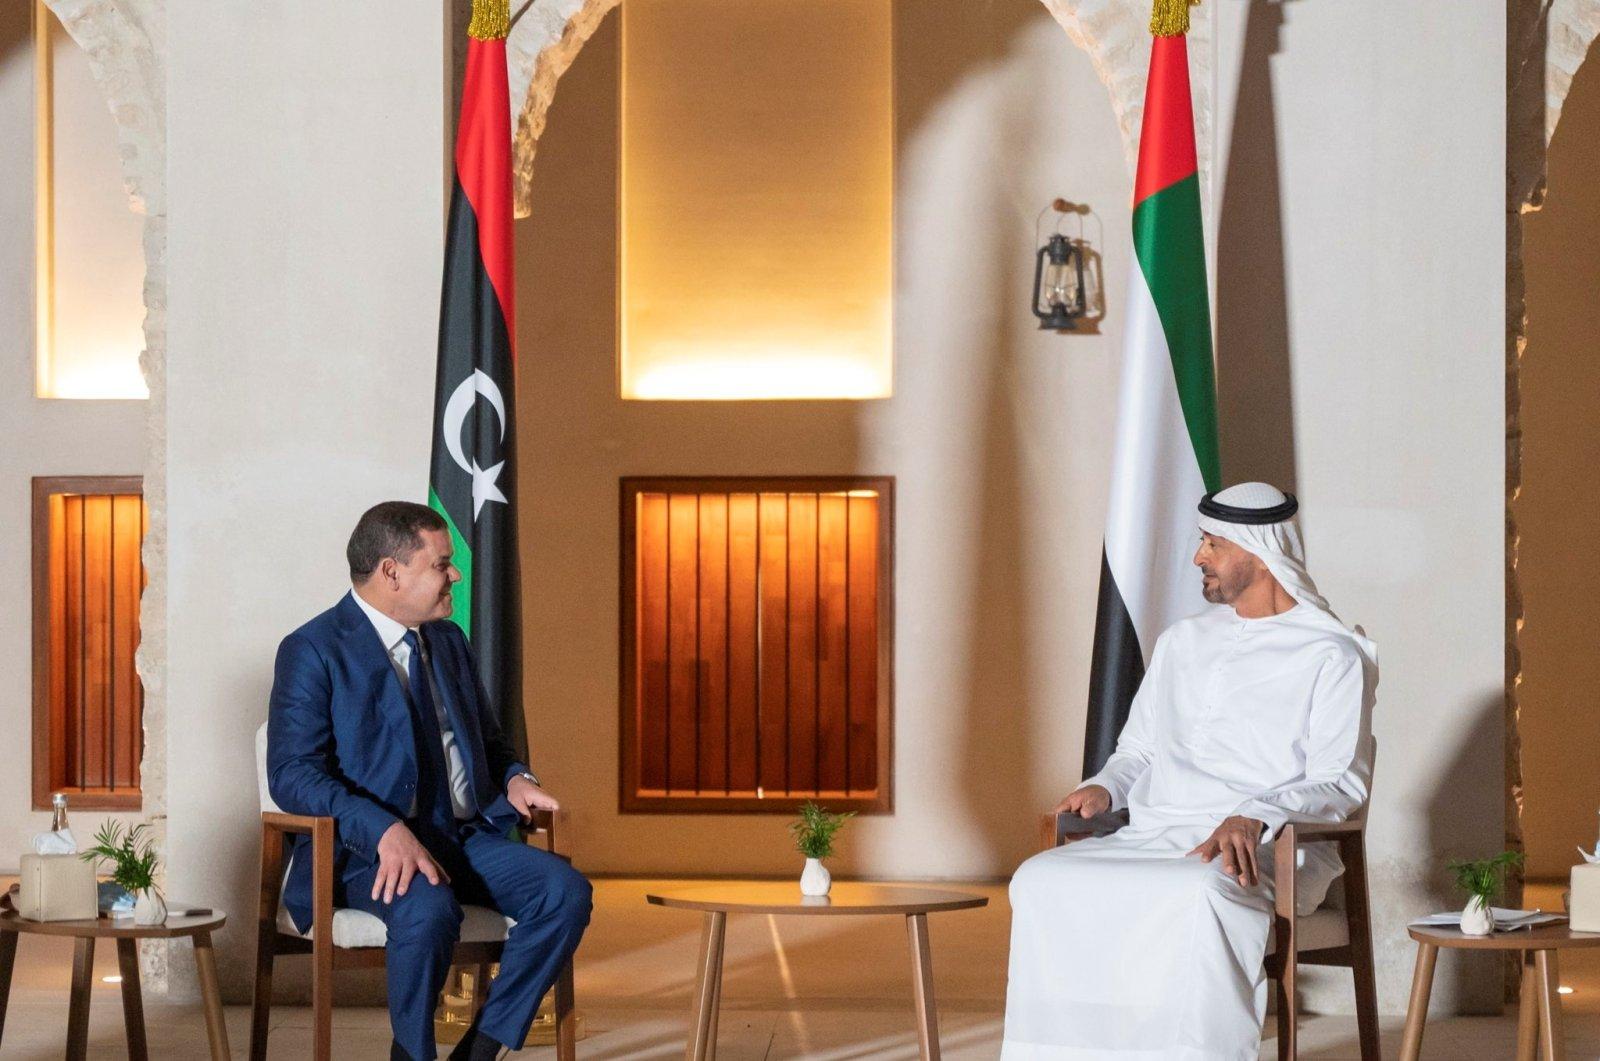 Abu Dhabi Crown Prince Sheikh Mohammed bin Zayed Al-Nahyan (R) receives Libya's interim Prime Minister Abdul Hamid Dbeibah in Abu Dhabi, the United Arab Emirates, April 7, 2021. (REUTERS Photo)